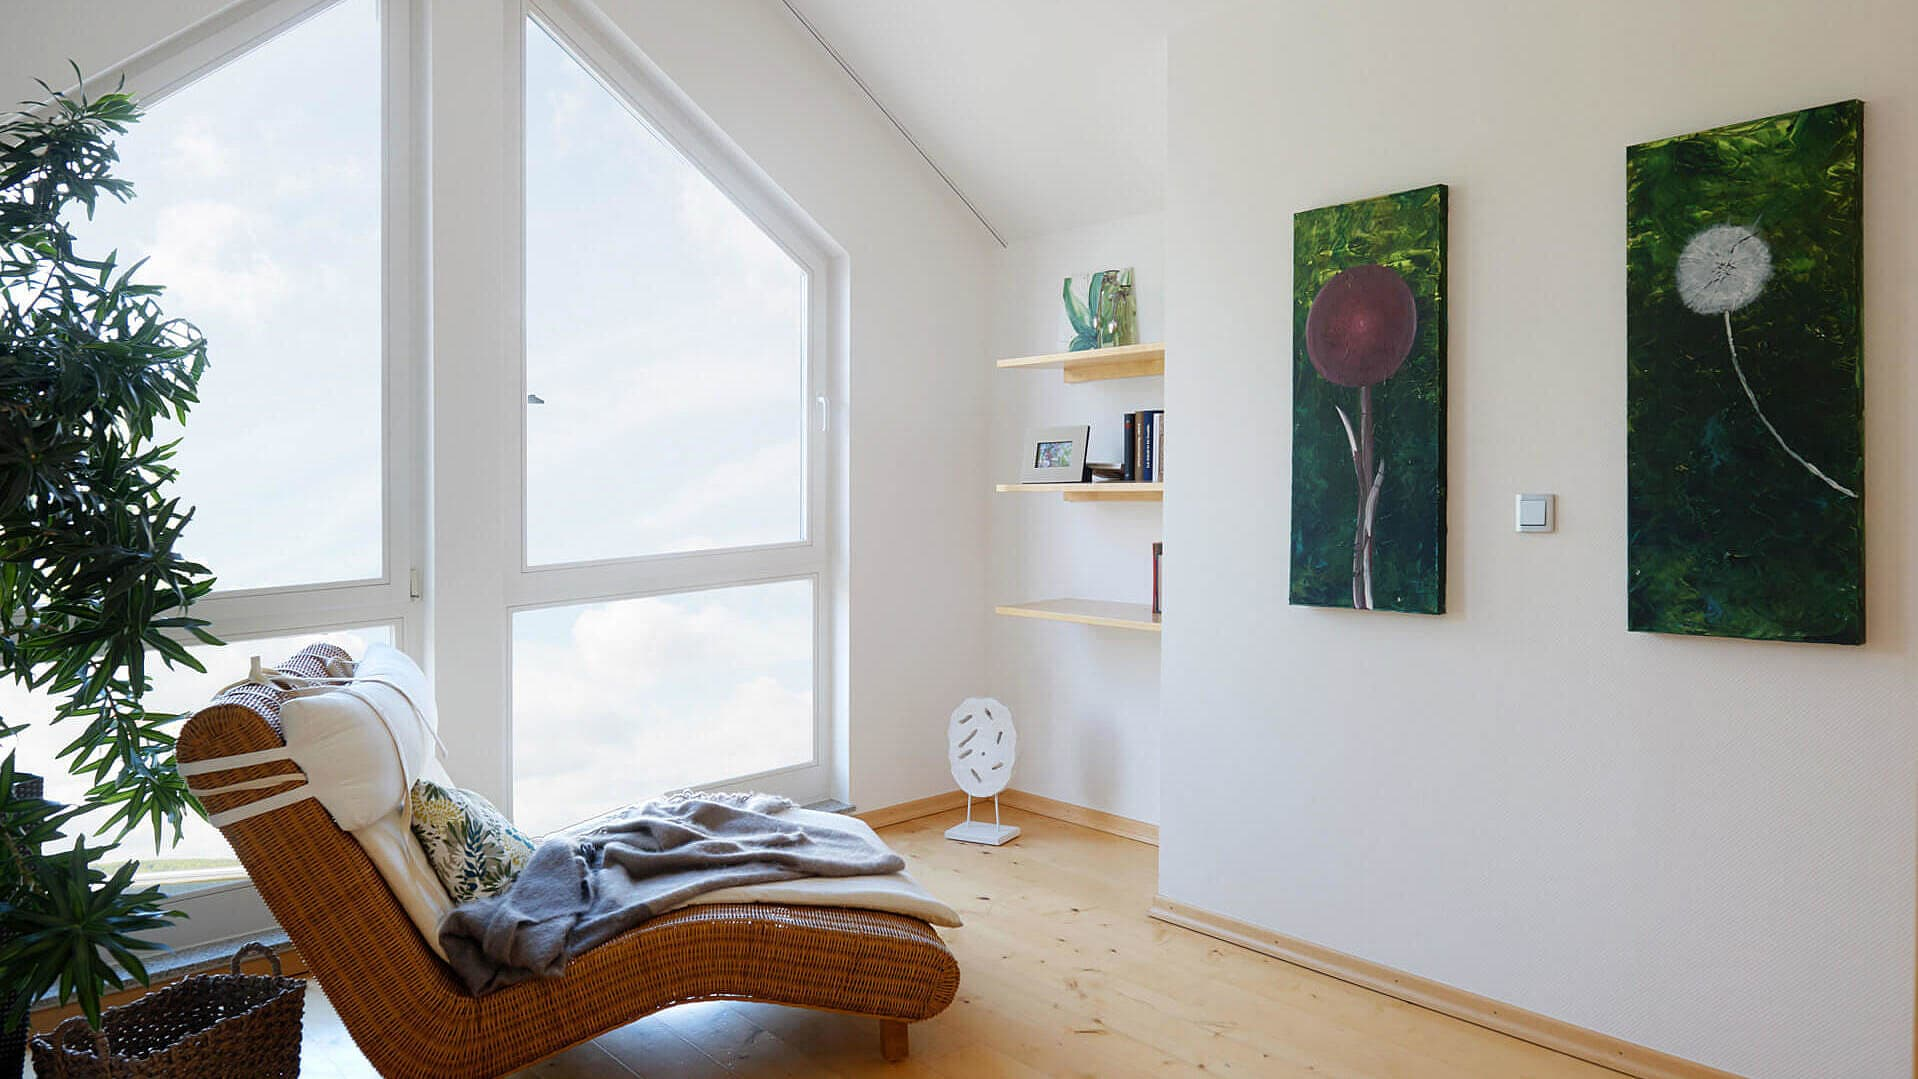 Musterhaus Bad Vilbel Galerie